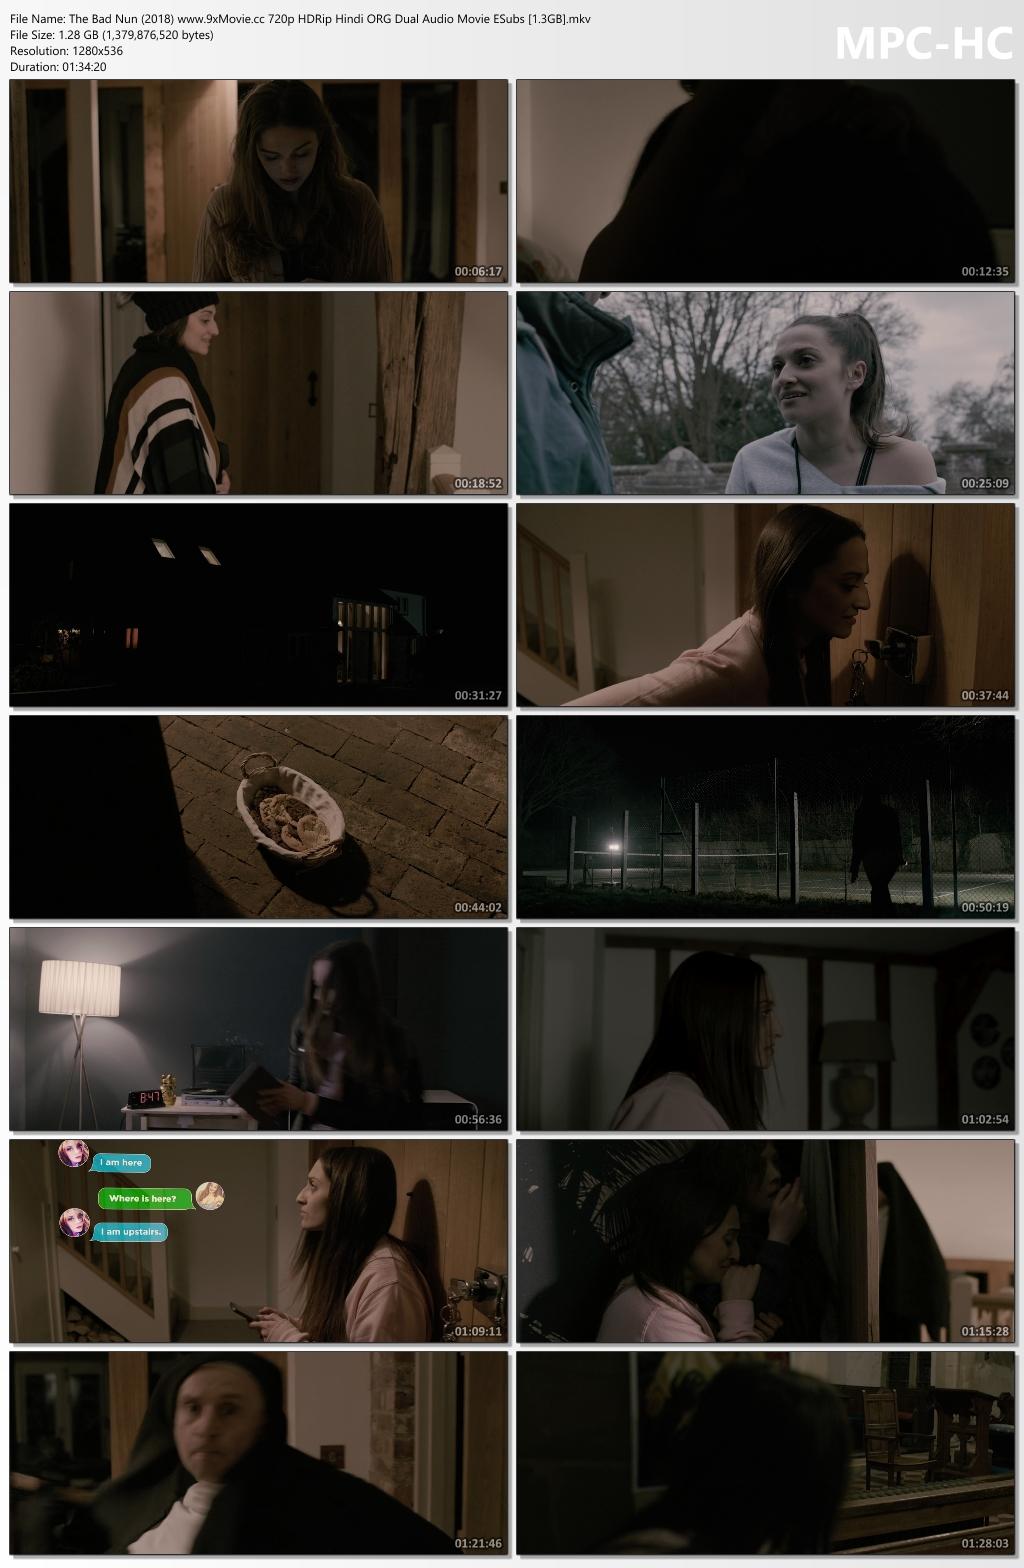 The-Bad-Nun-2018-www-9x-Movie-cc-720p-HDRip-Hindi-ORG-Dual-Audio-Movie-ESubs-1-3-GB-mkv